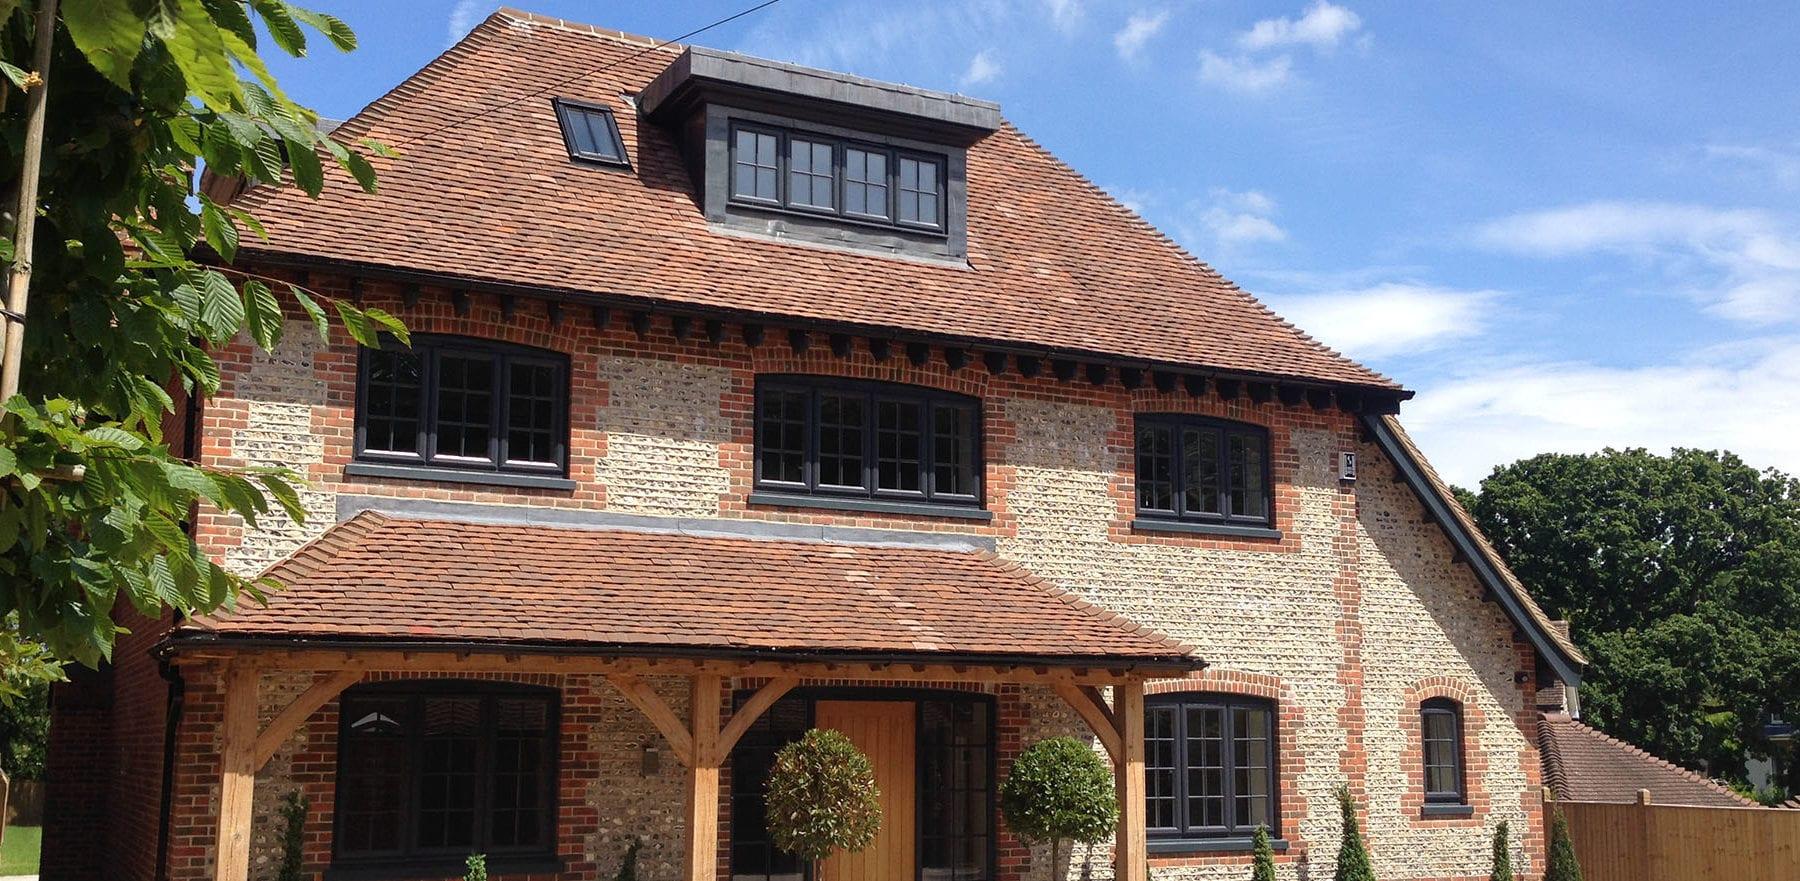 Lifestiles - Handmade Brown Clay Roof Tiles - Bosham, England